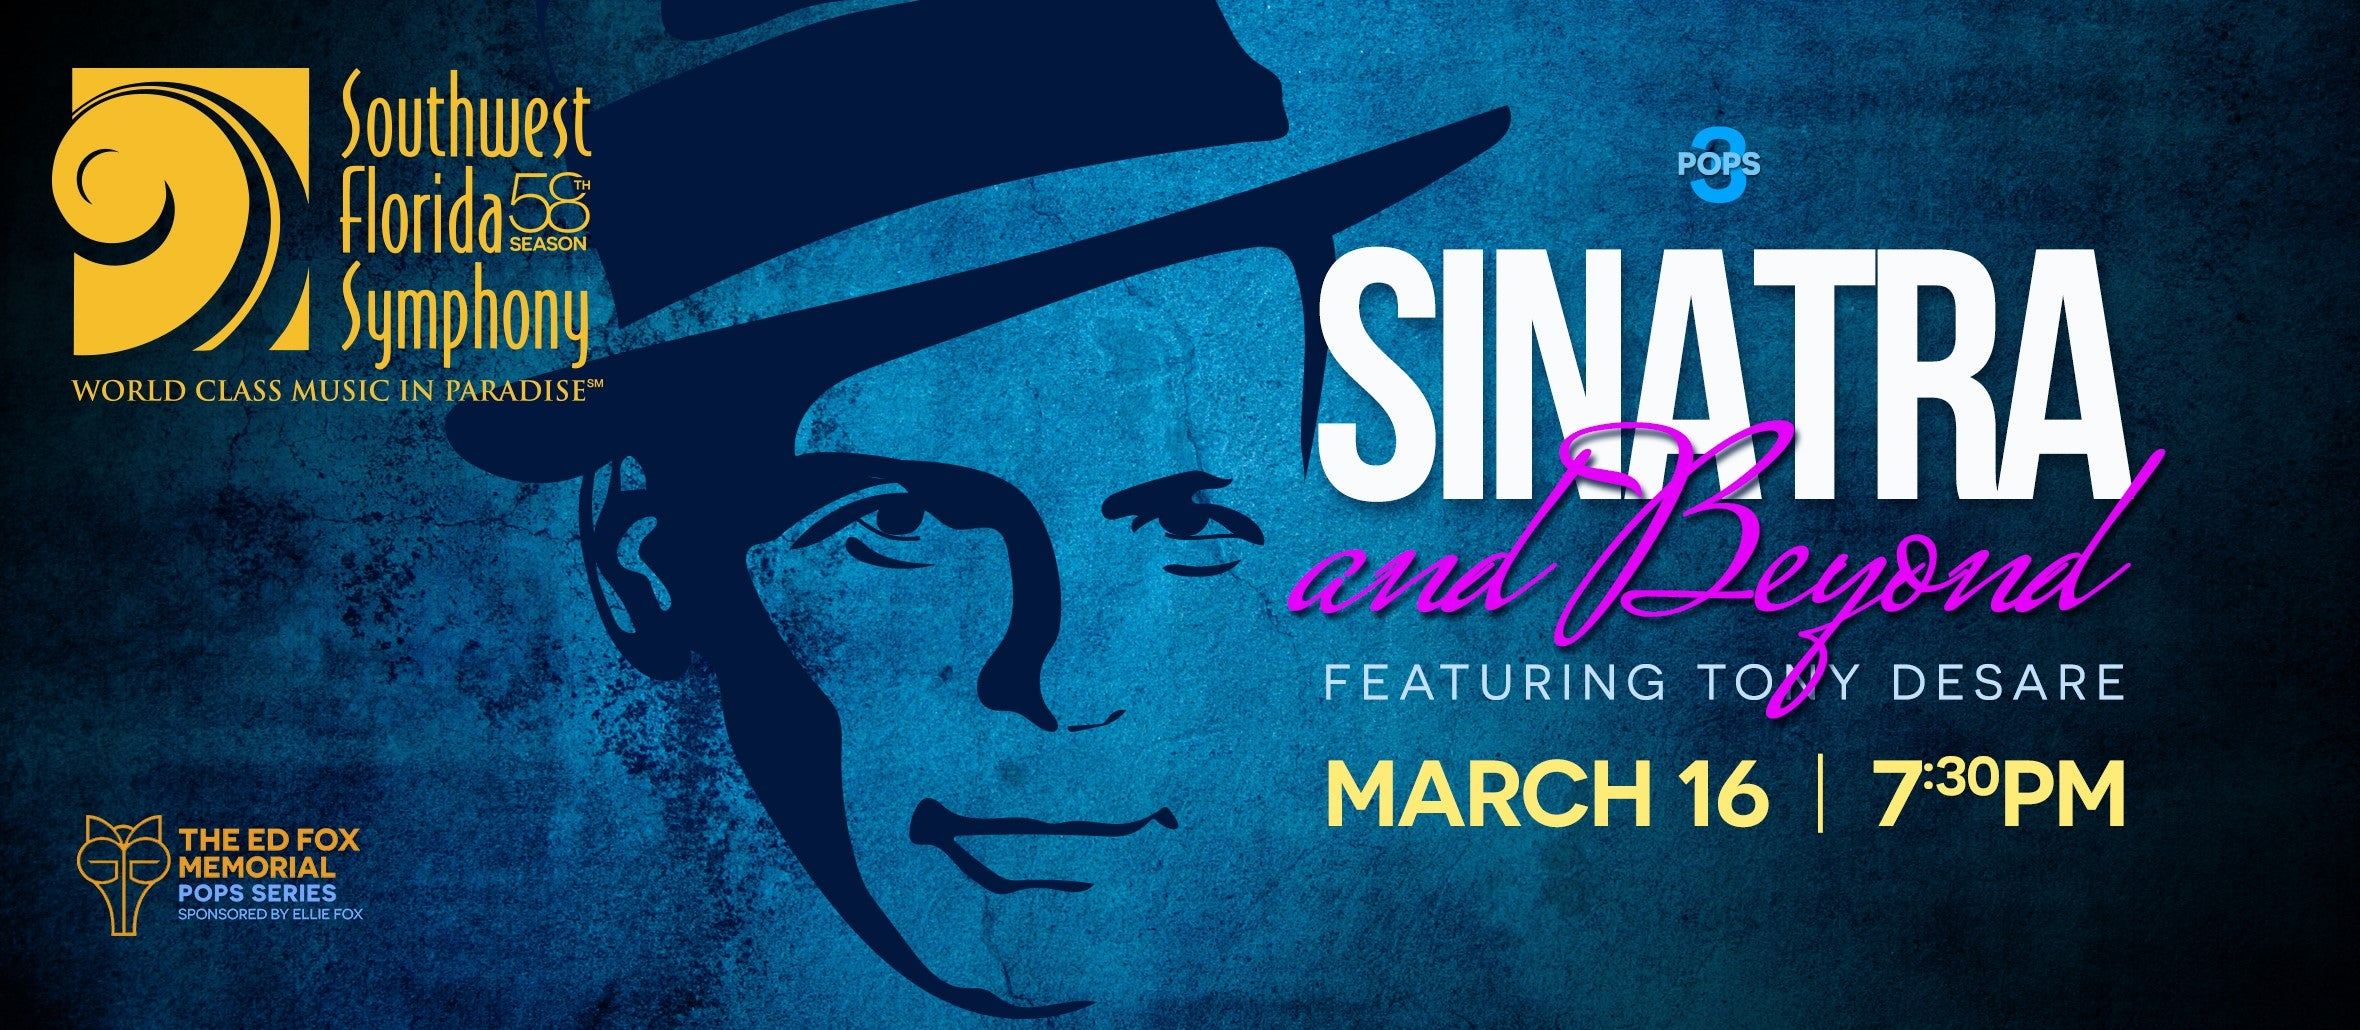 Southwest Florida Symphony: Sinatra and Beyond